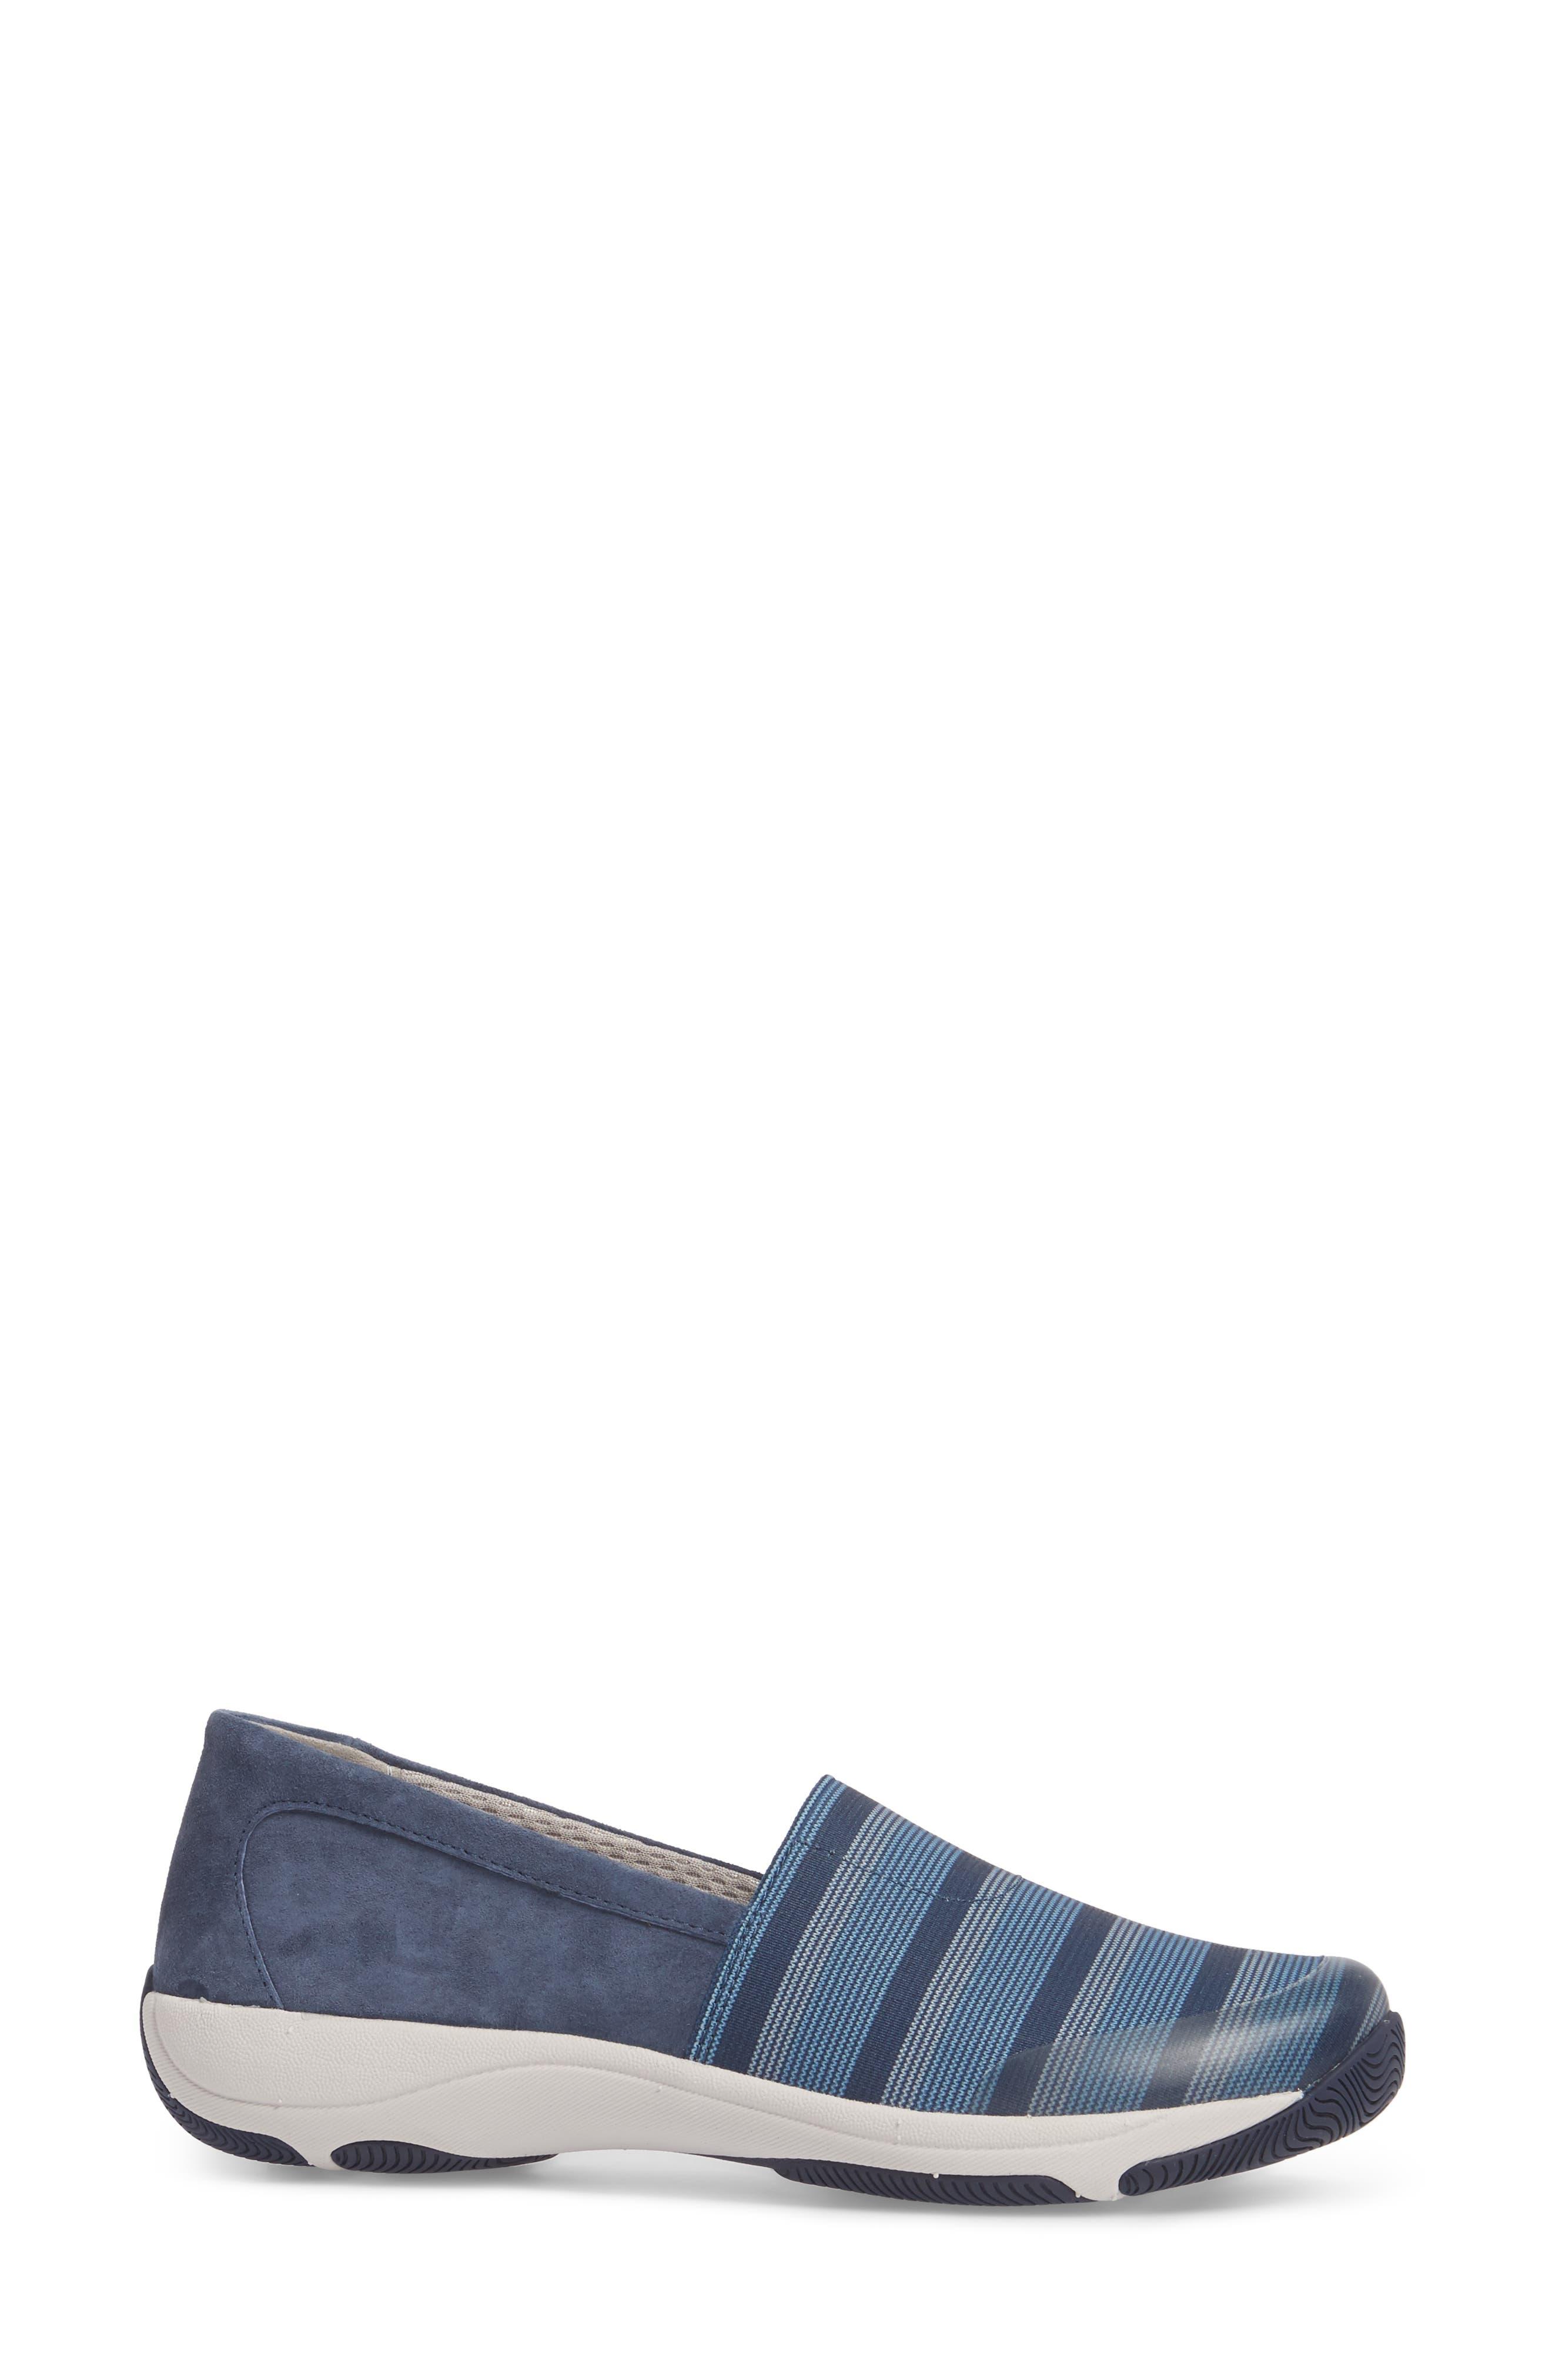 Harriet Slip-On Sneaker,                             Alternate thumbnail 3, color,                             Blue Suede